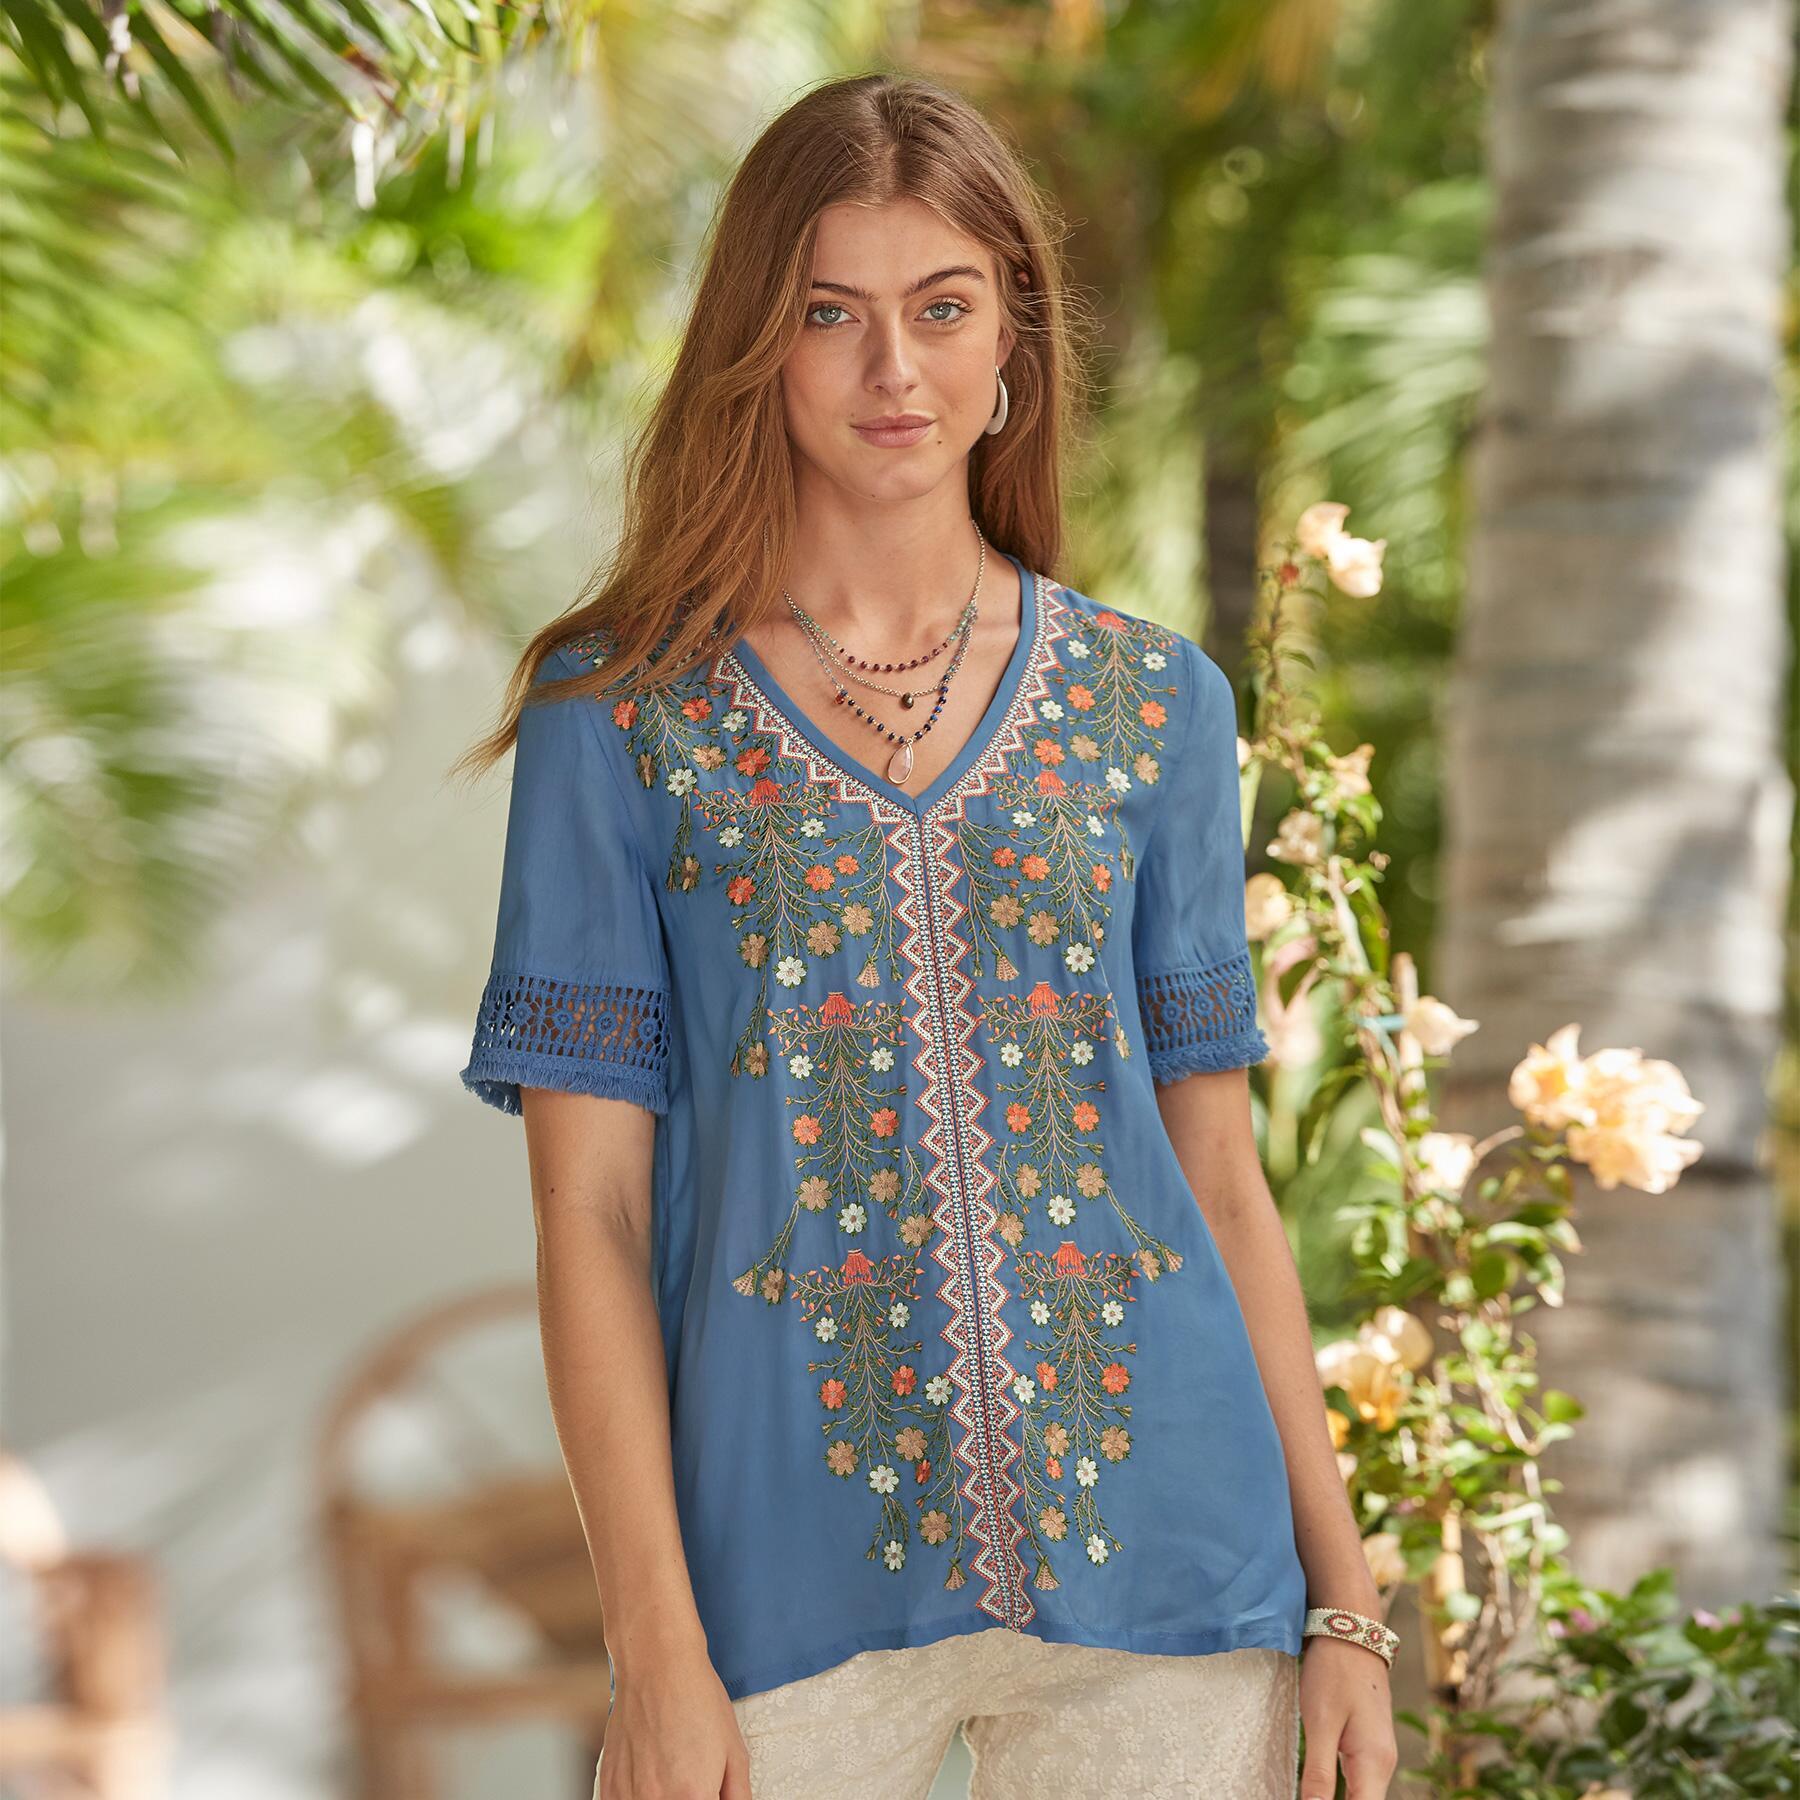 sundance embroidered top